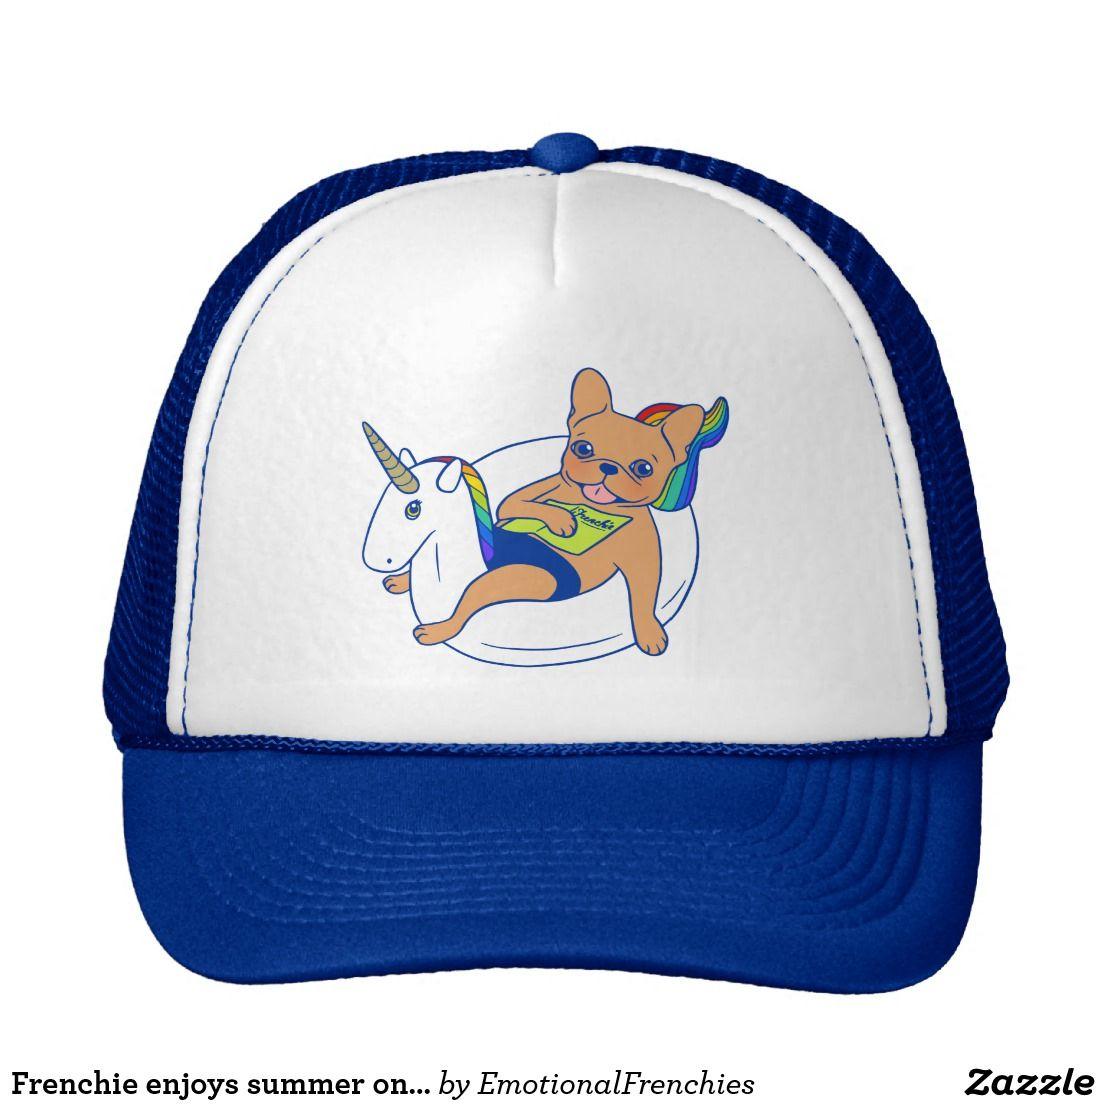 5185eb1a07b Frenchie enjoys summer on unicorn pool float trucker hat